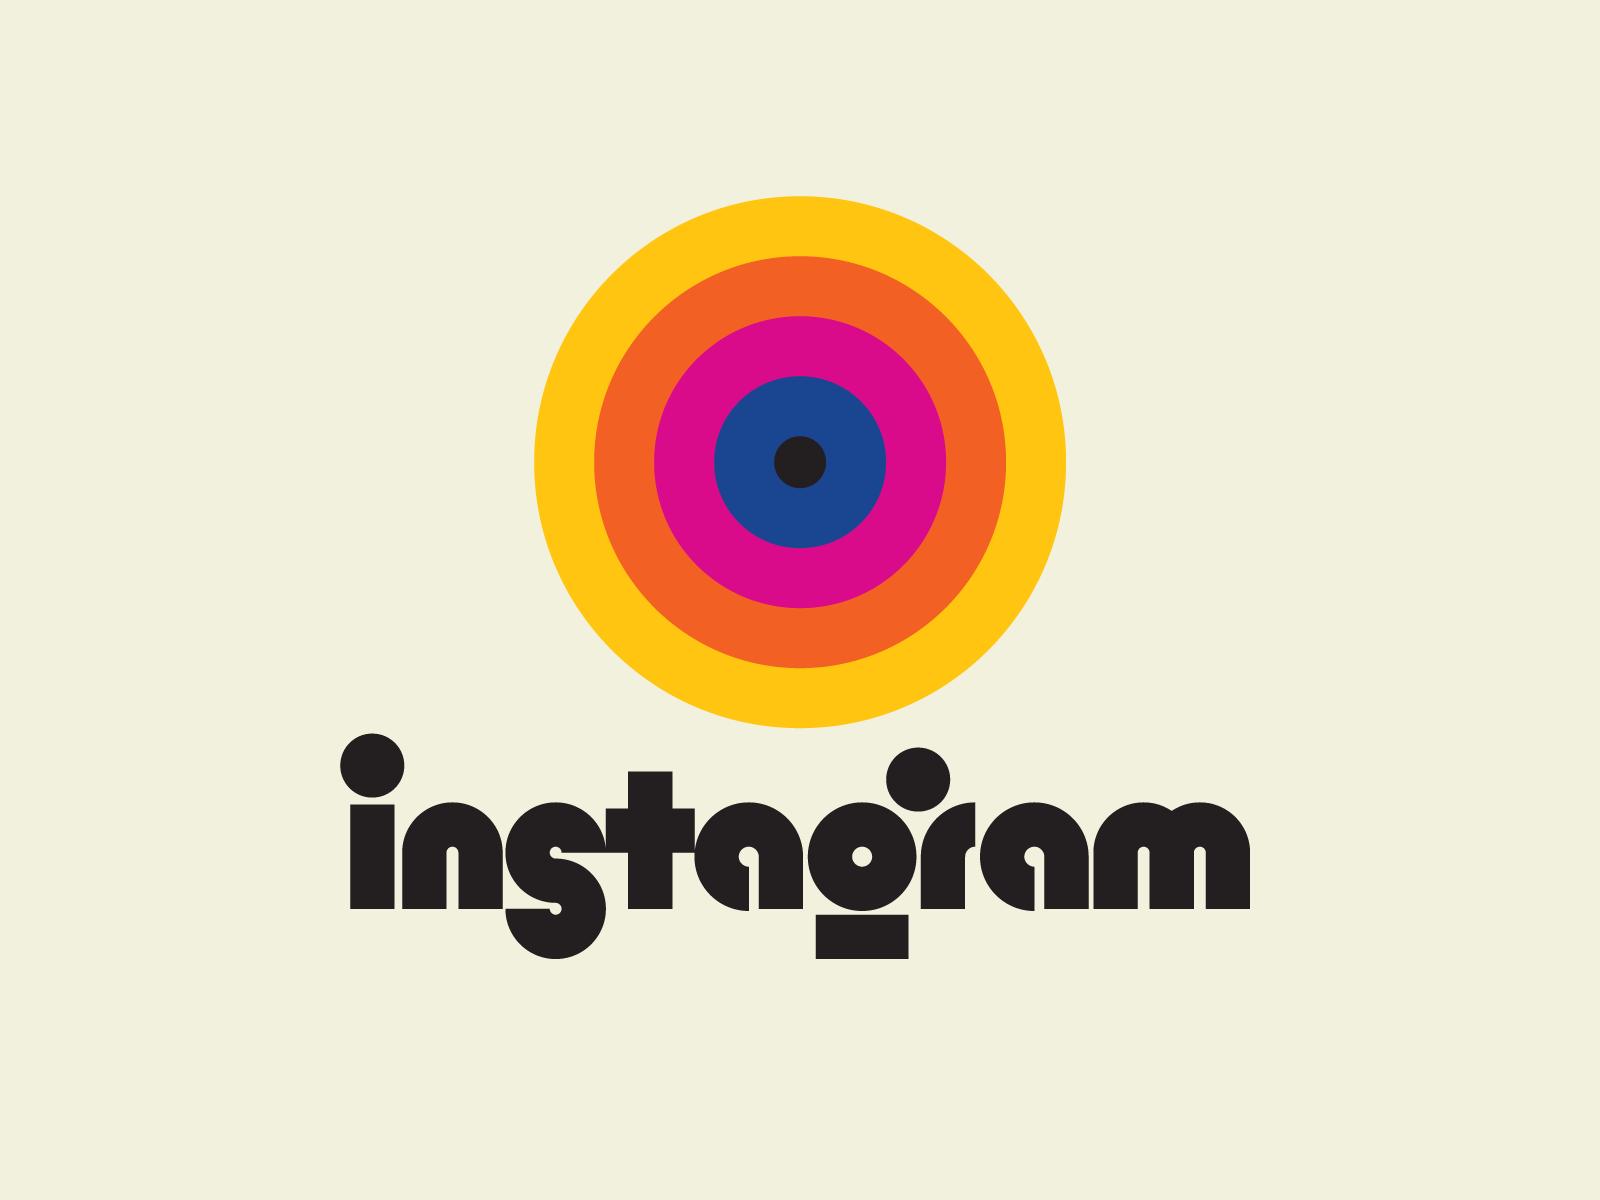 Retro Instagram logo